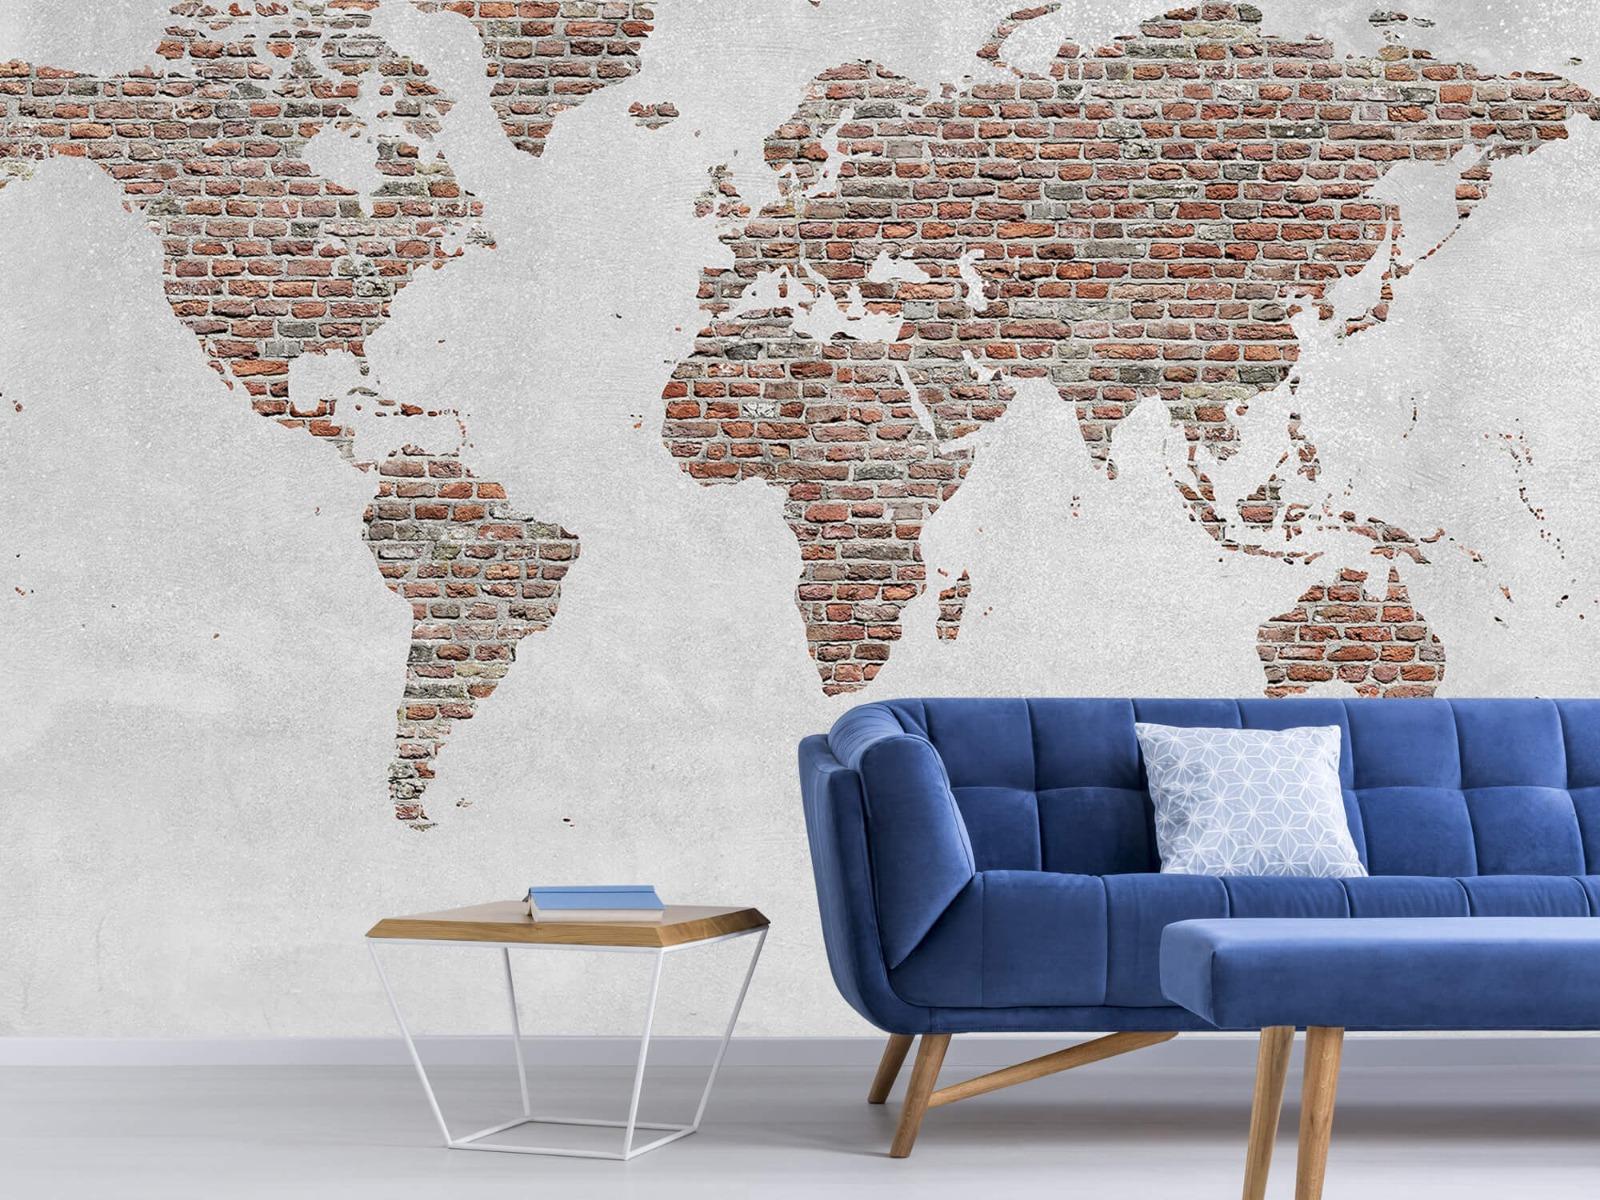 Steen behang - Wereldkaart stenen - Slaapkamer 4